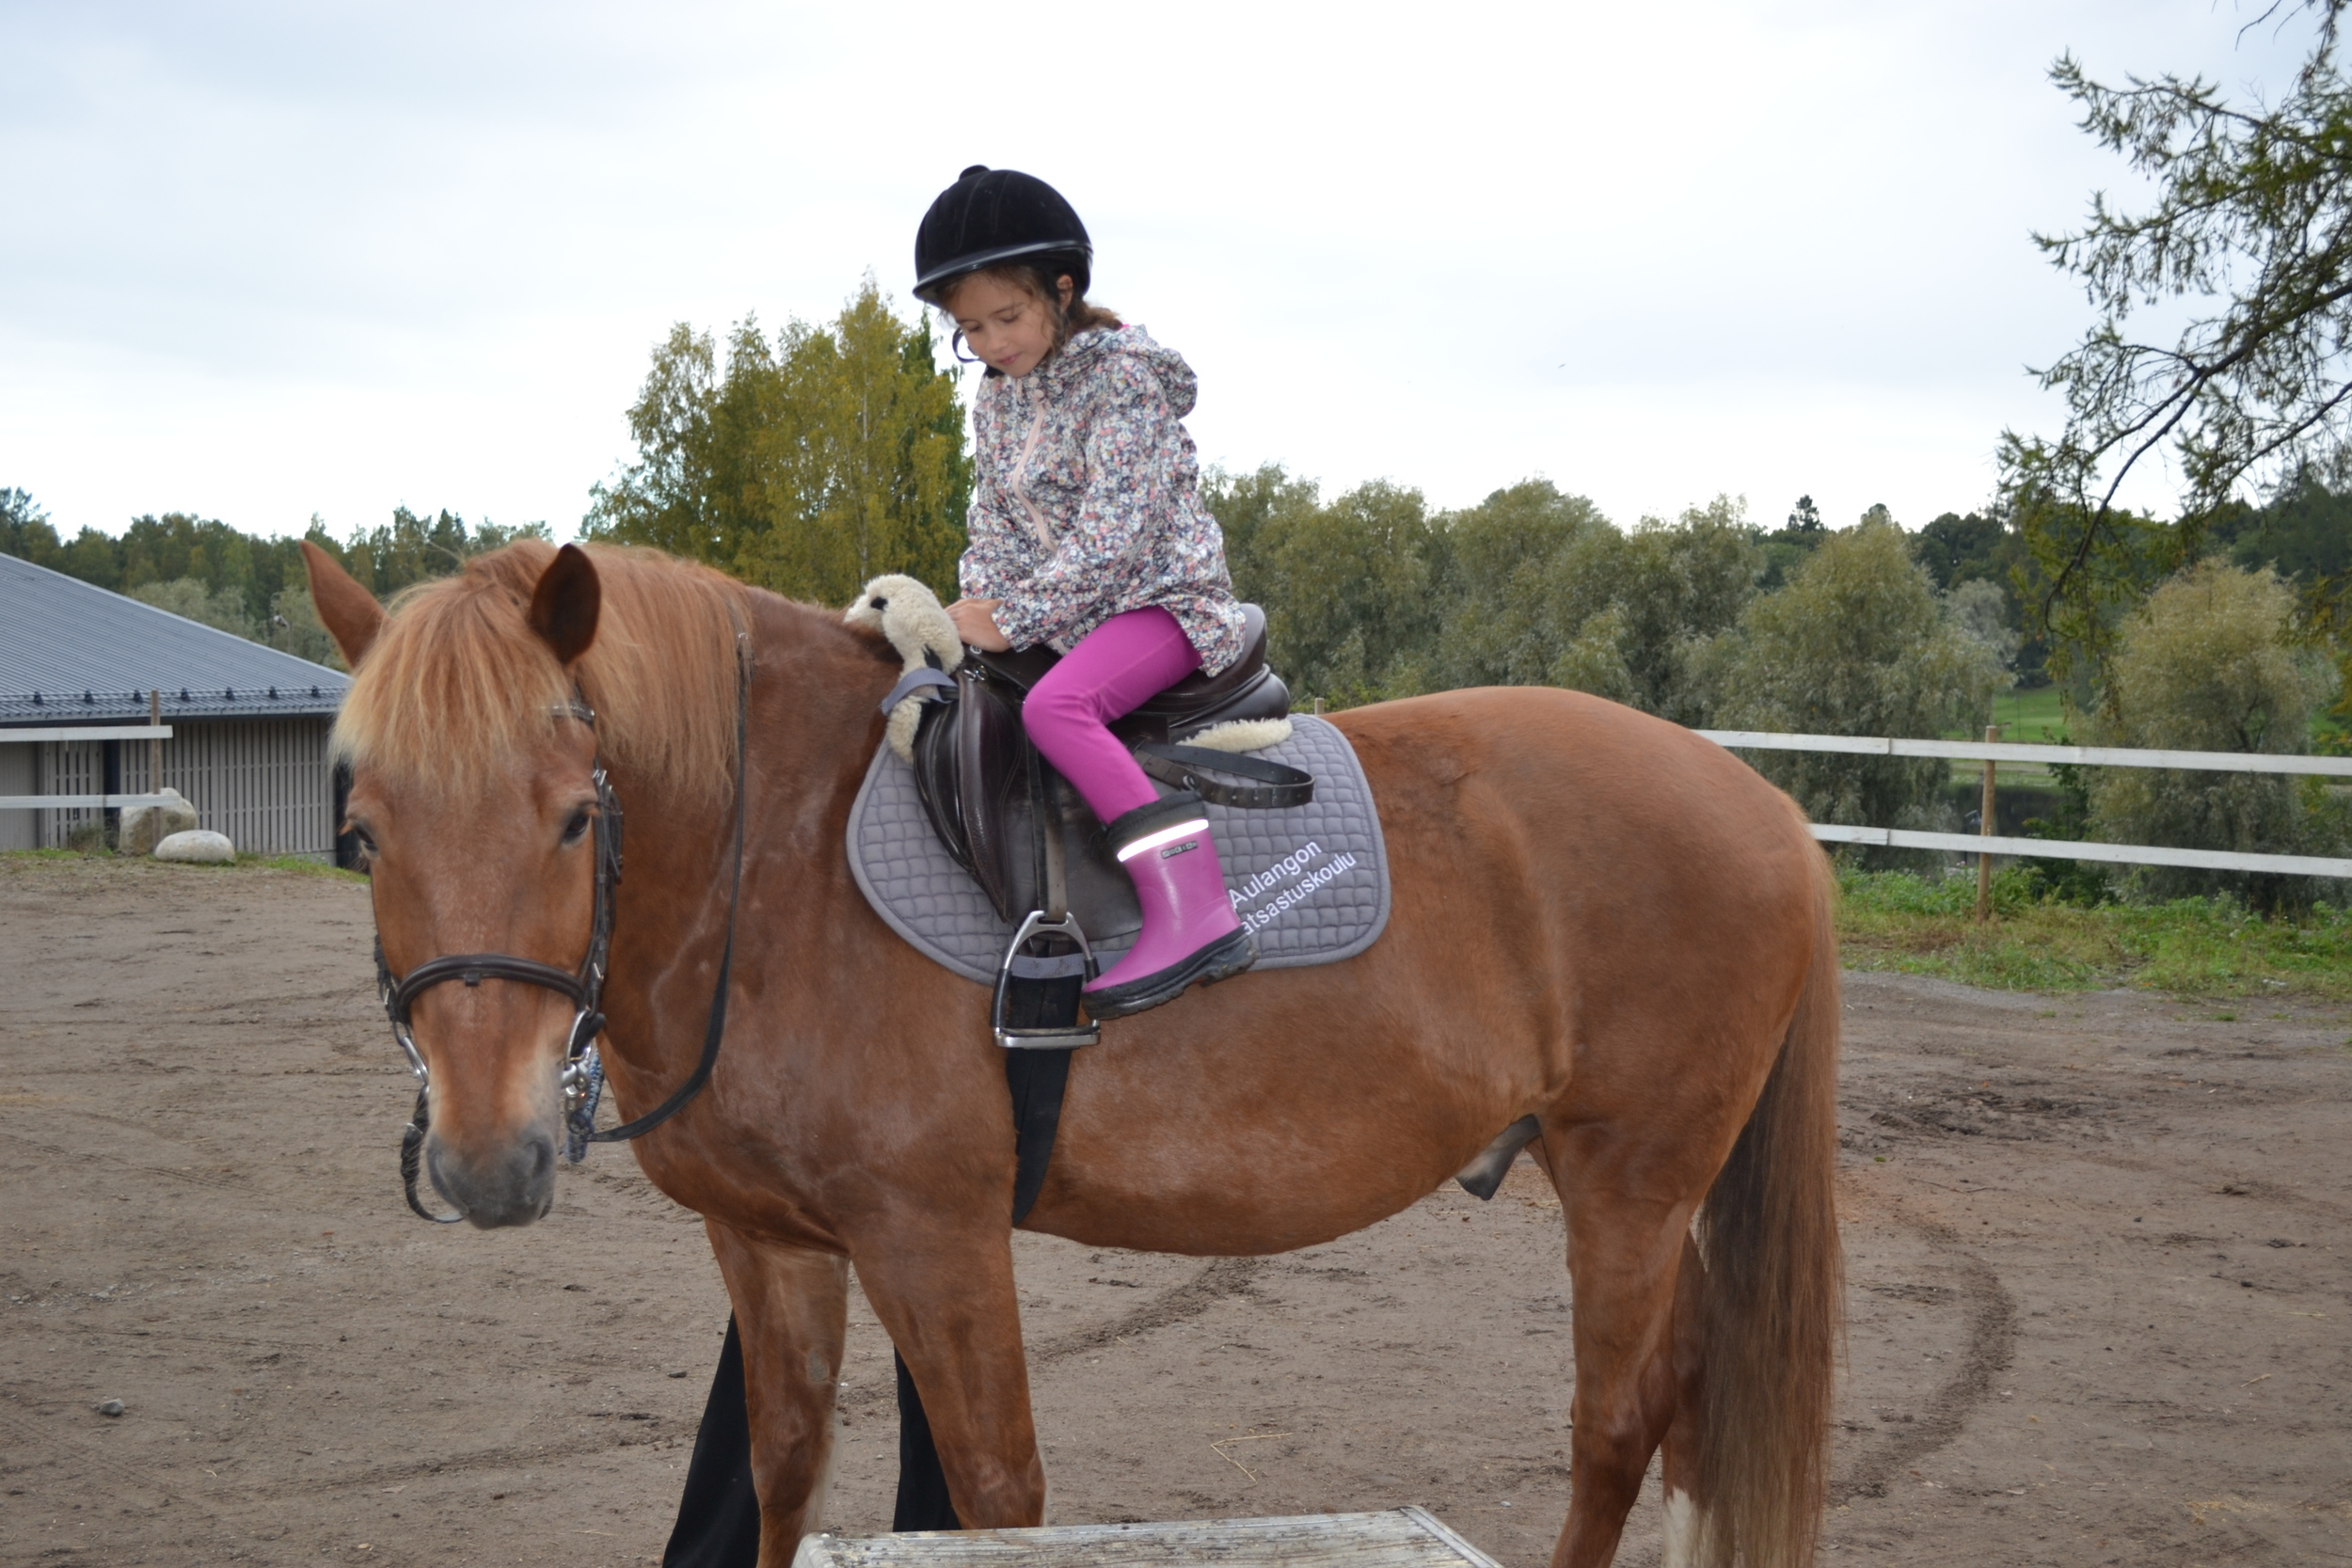 This horse was called Jouko